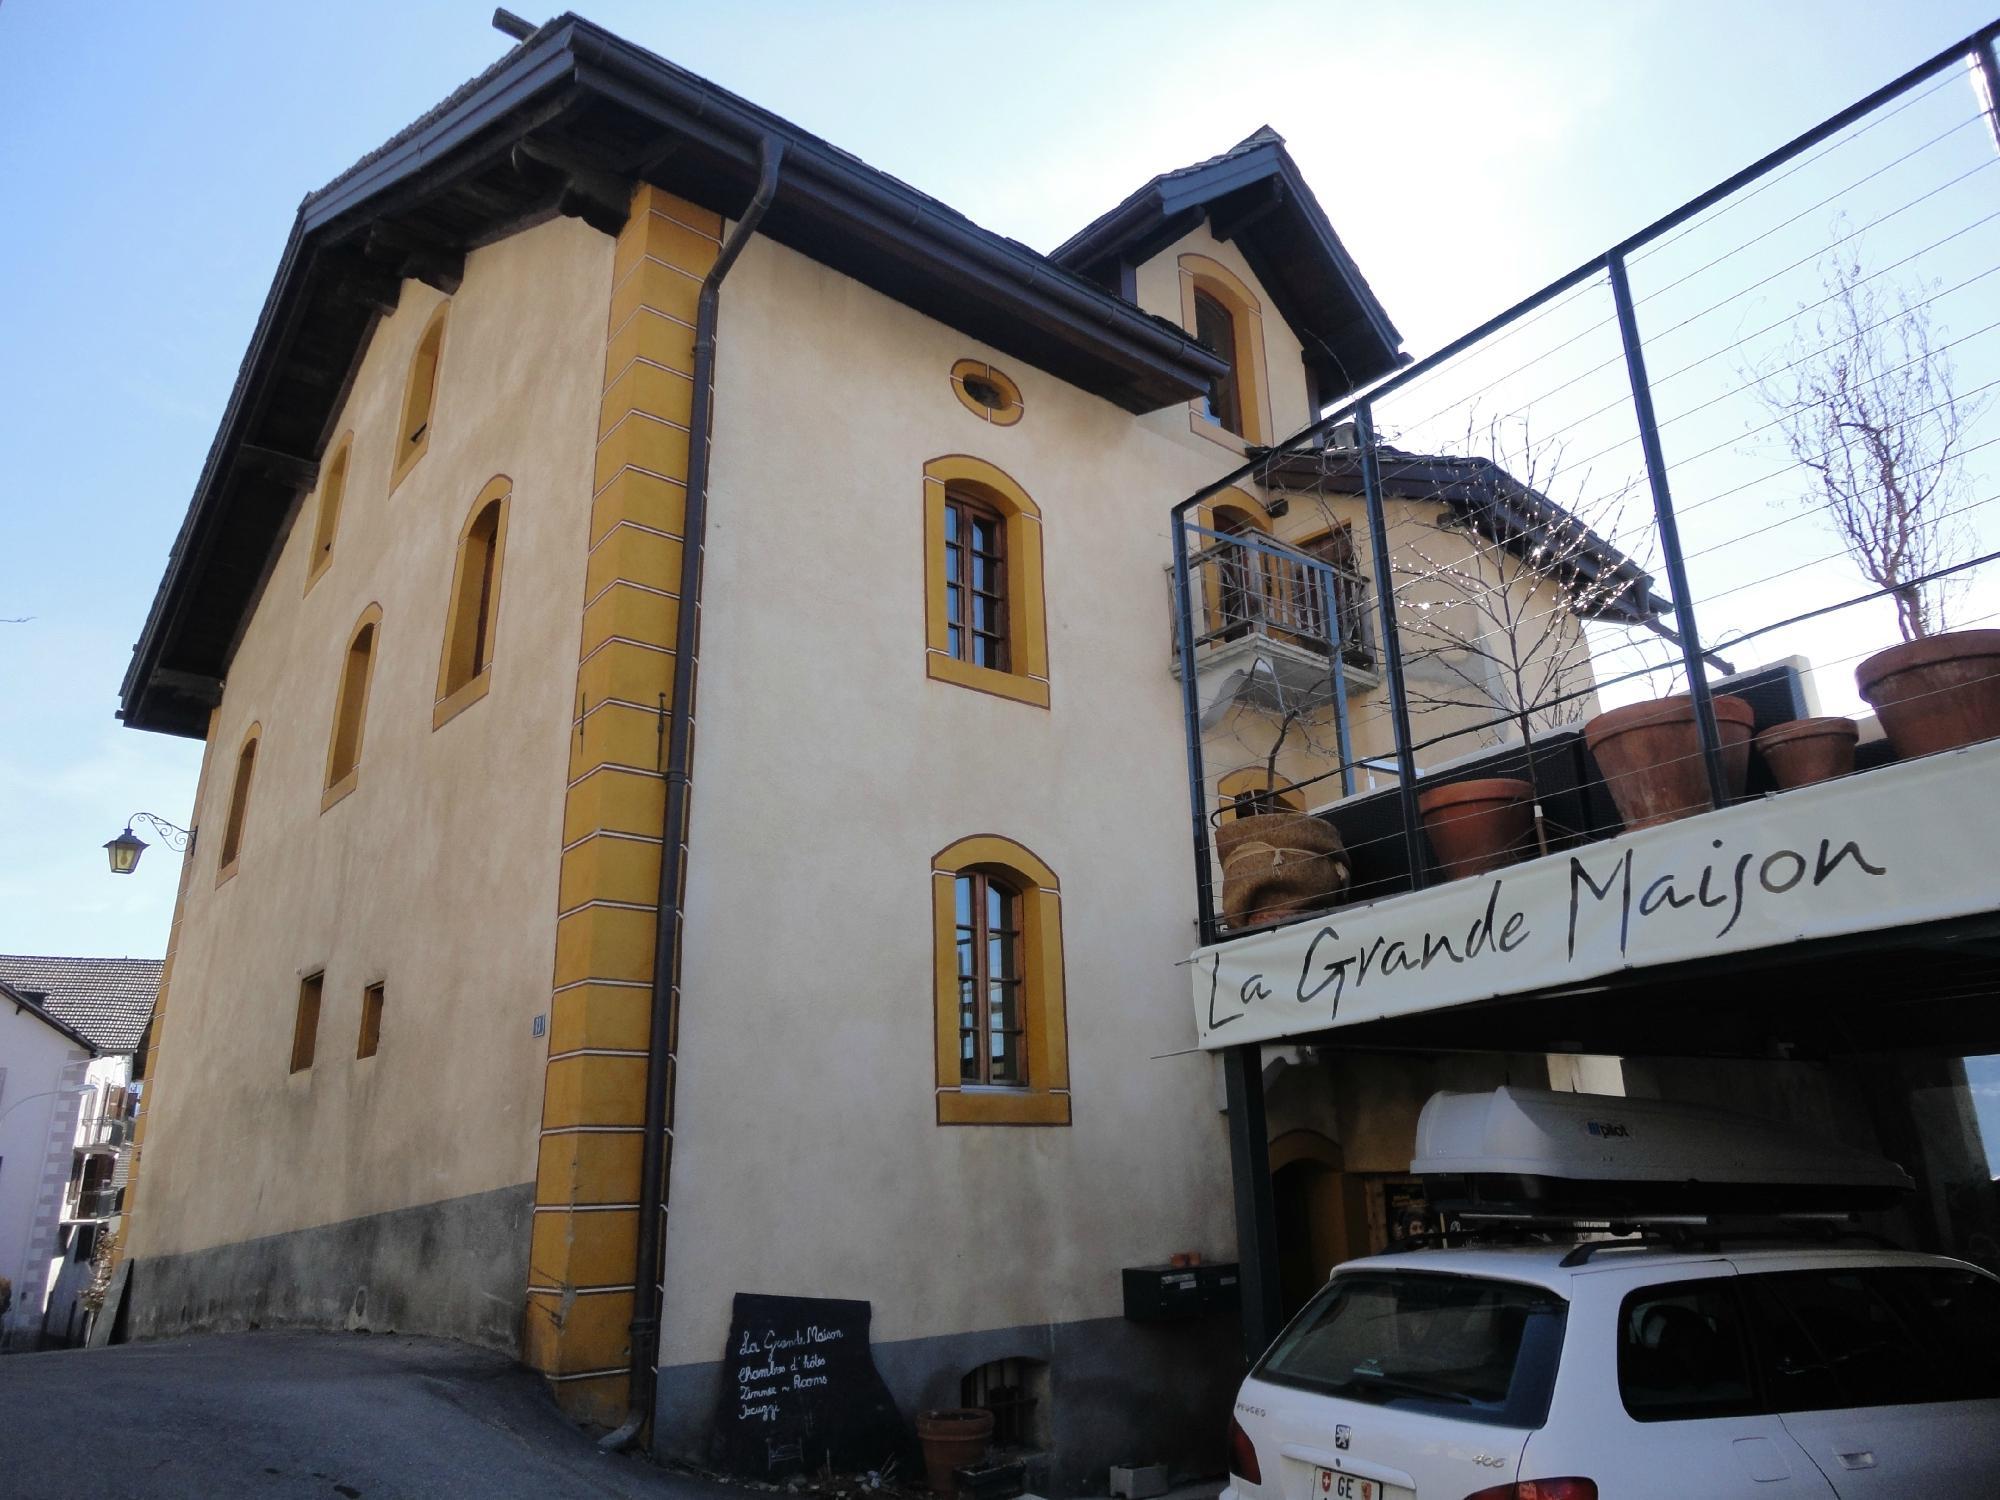 La Grande Maison de Chandolin